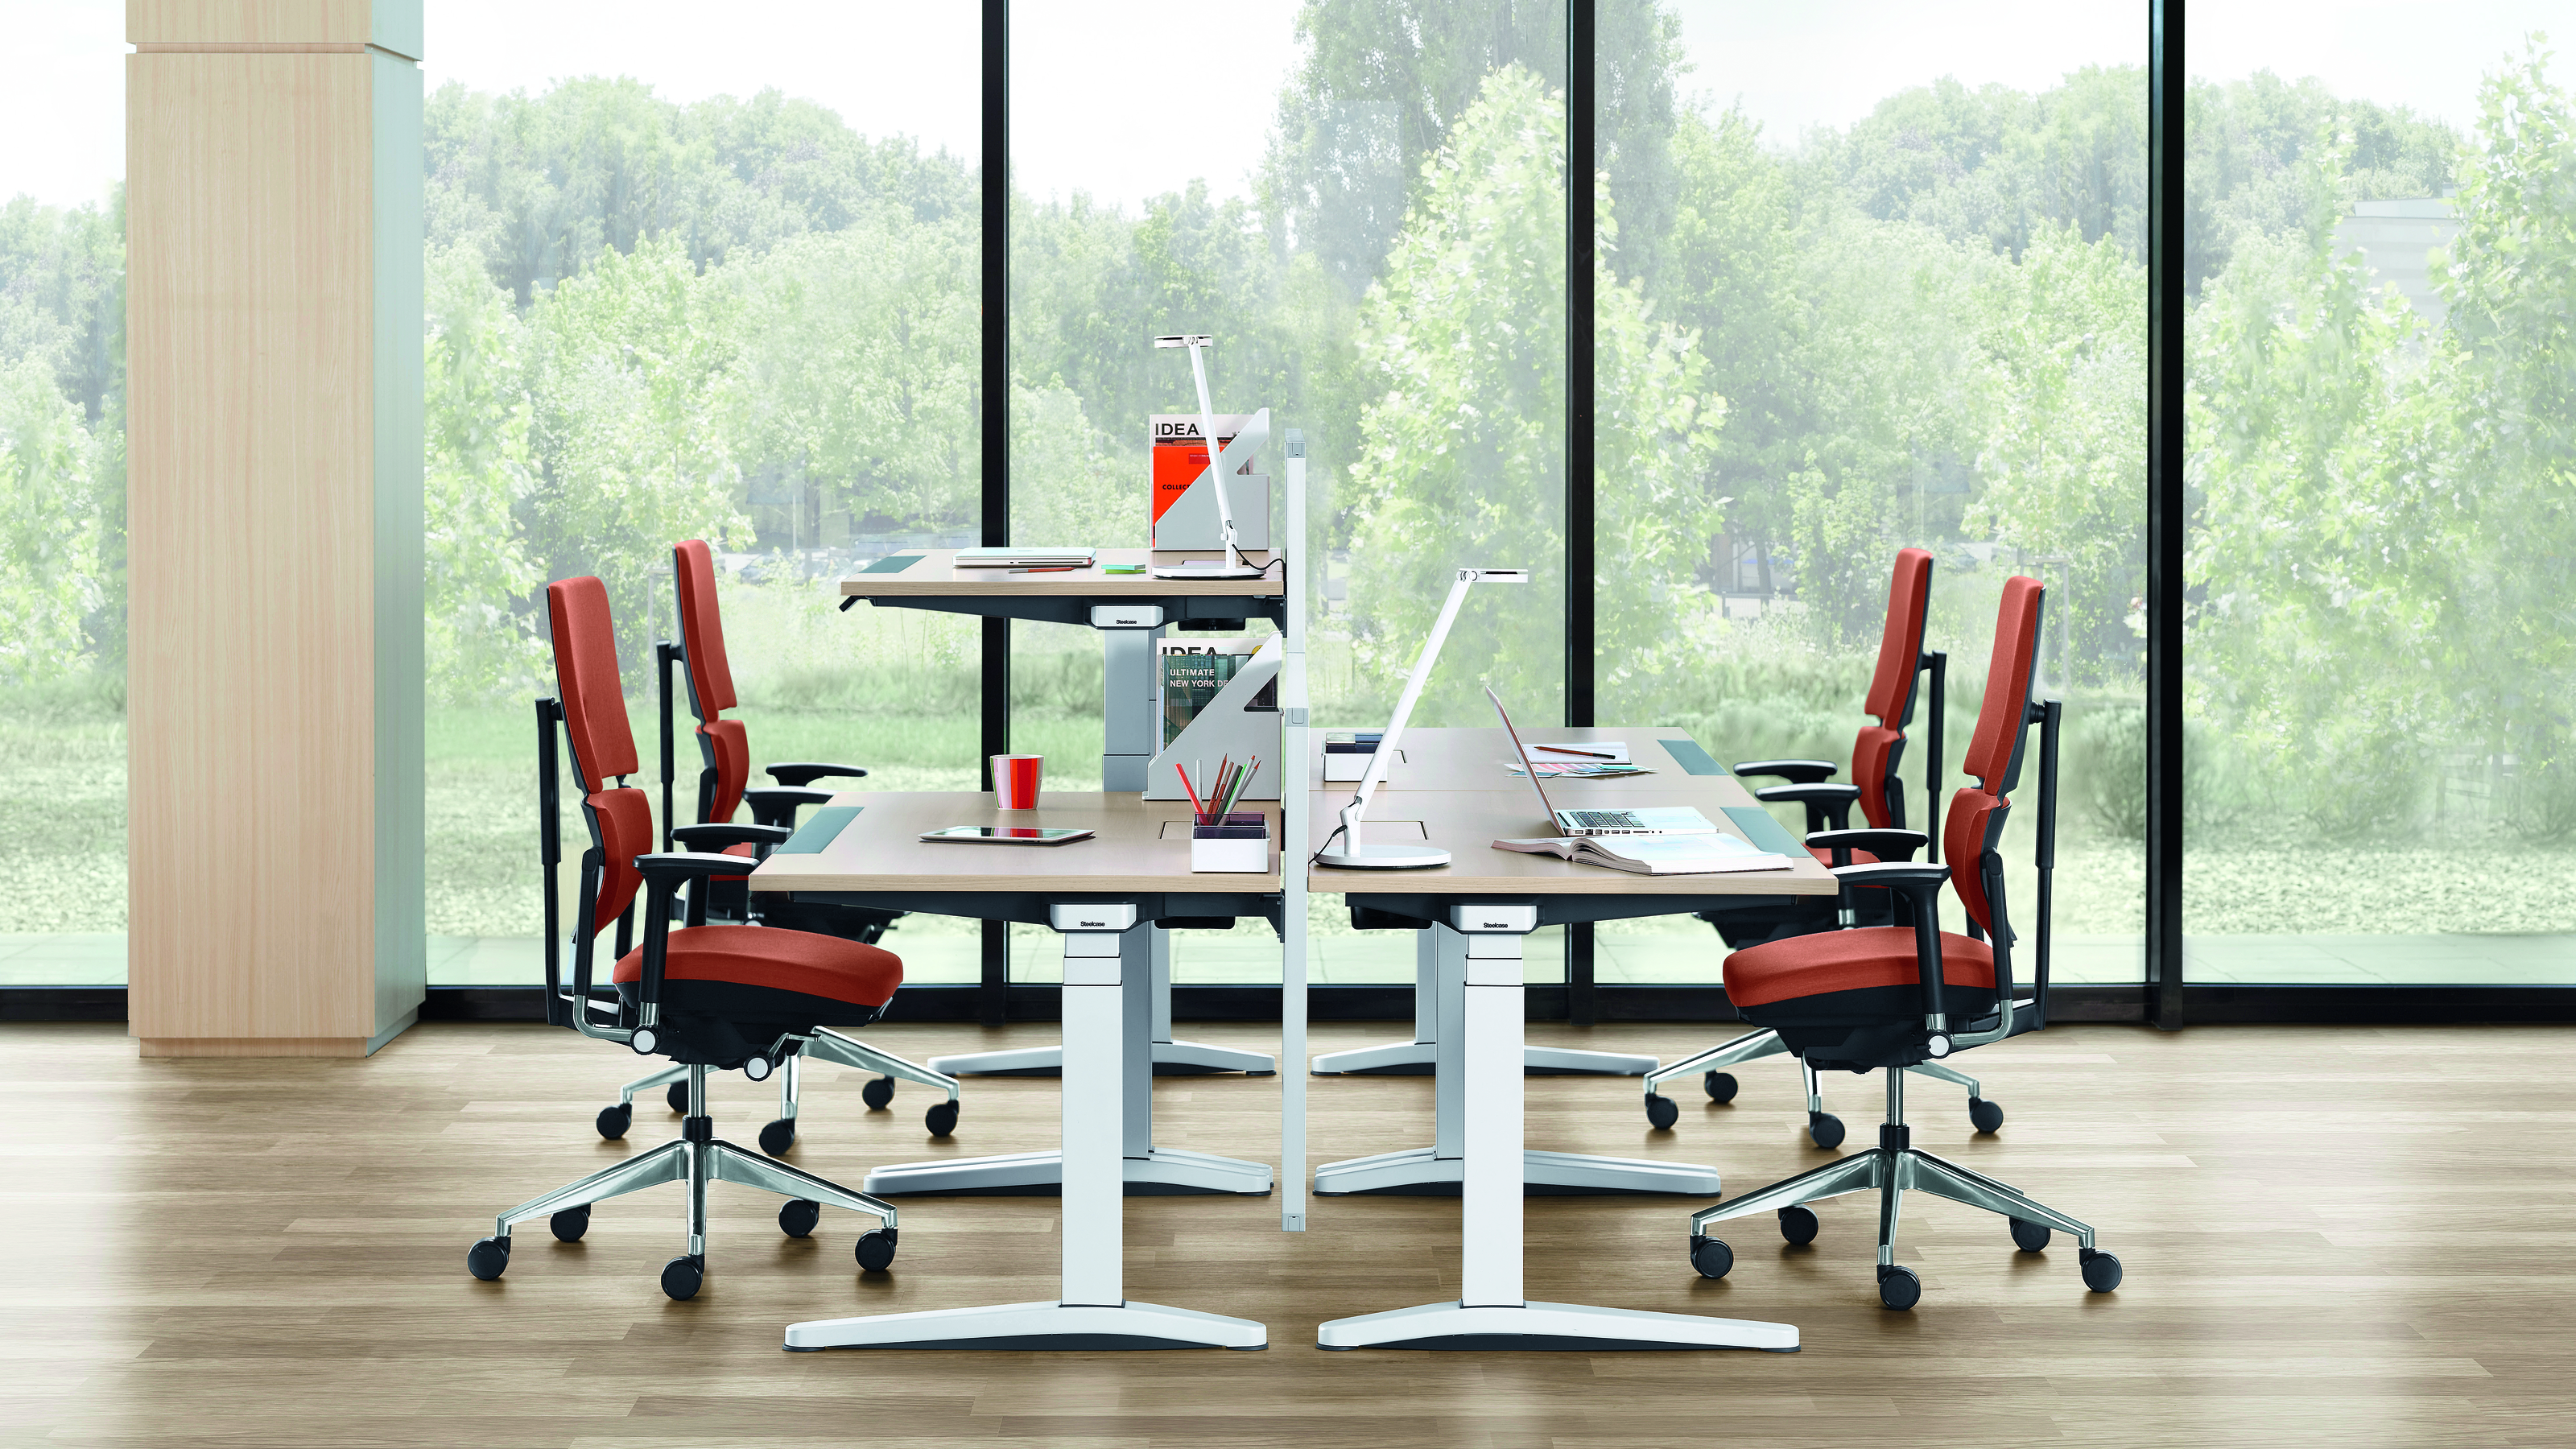 2d amp 3d space planning ecos office furniture - 2d Amp 3d Space Planning Ecos Office Furniture 35